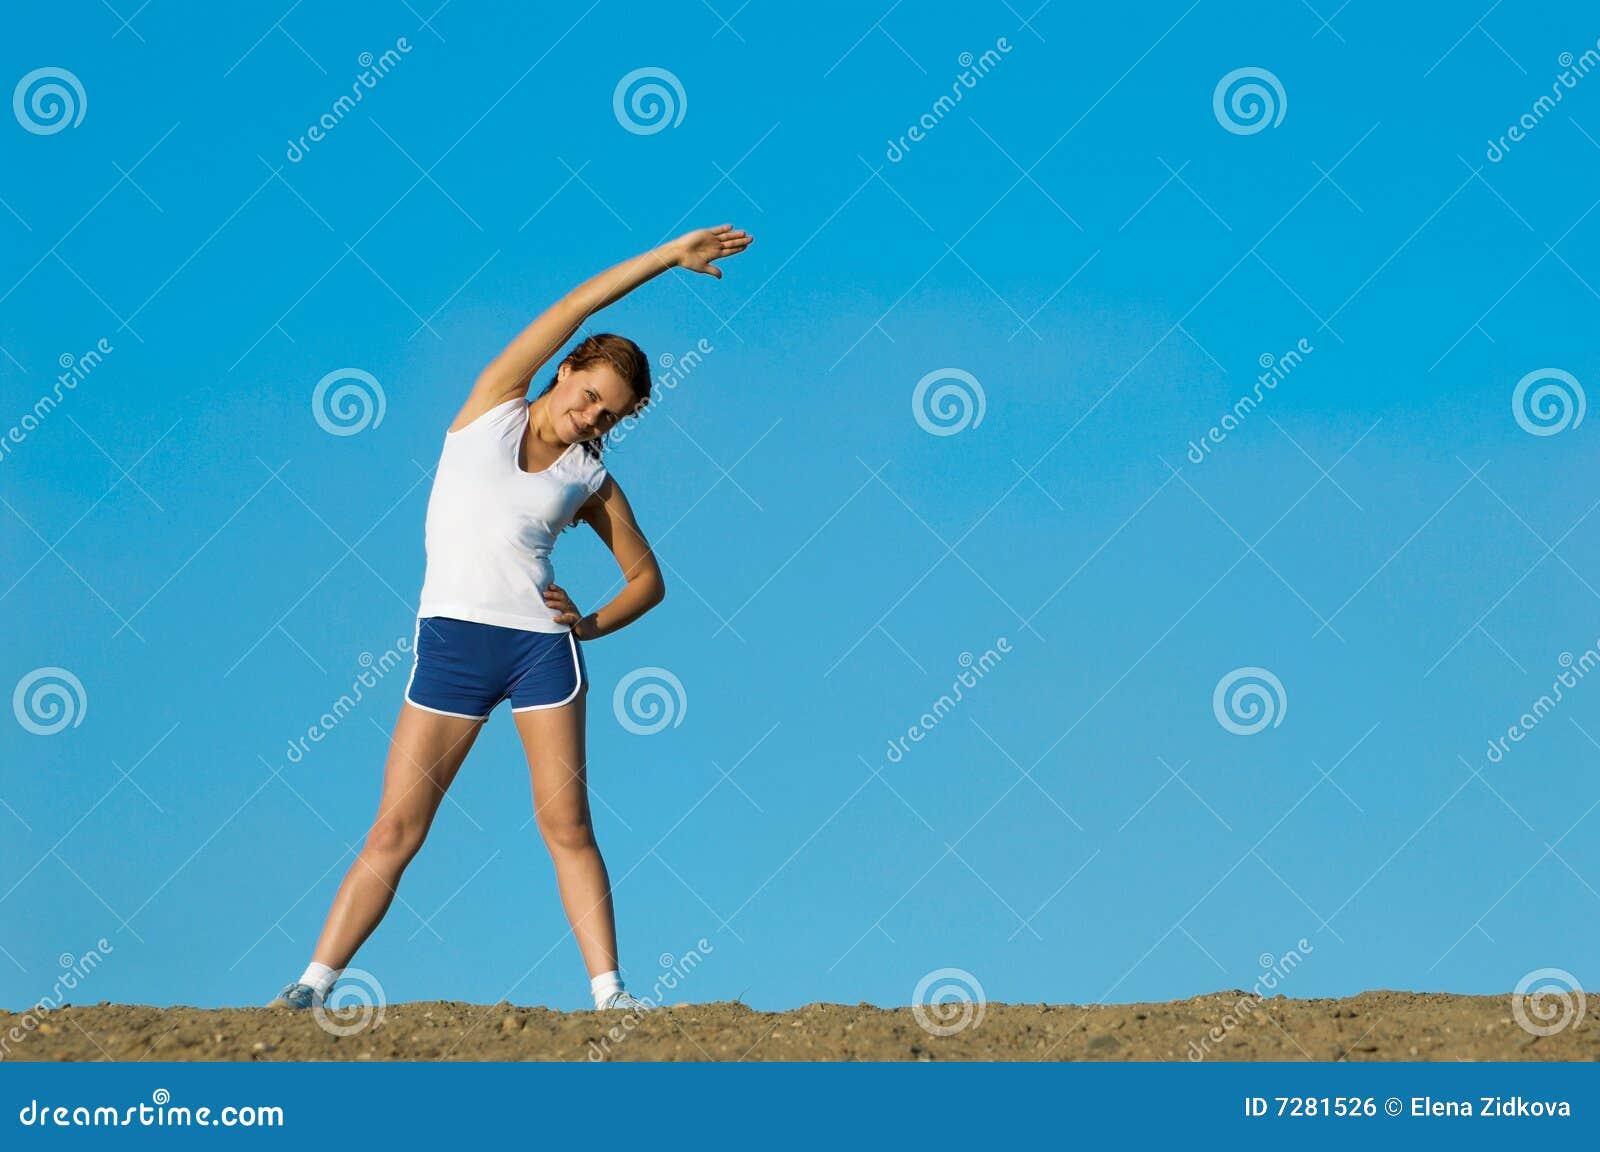 La chica joven juega deportes